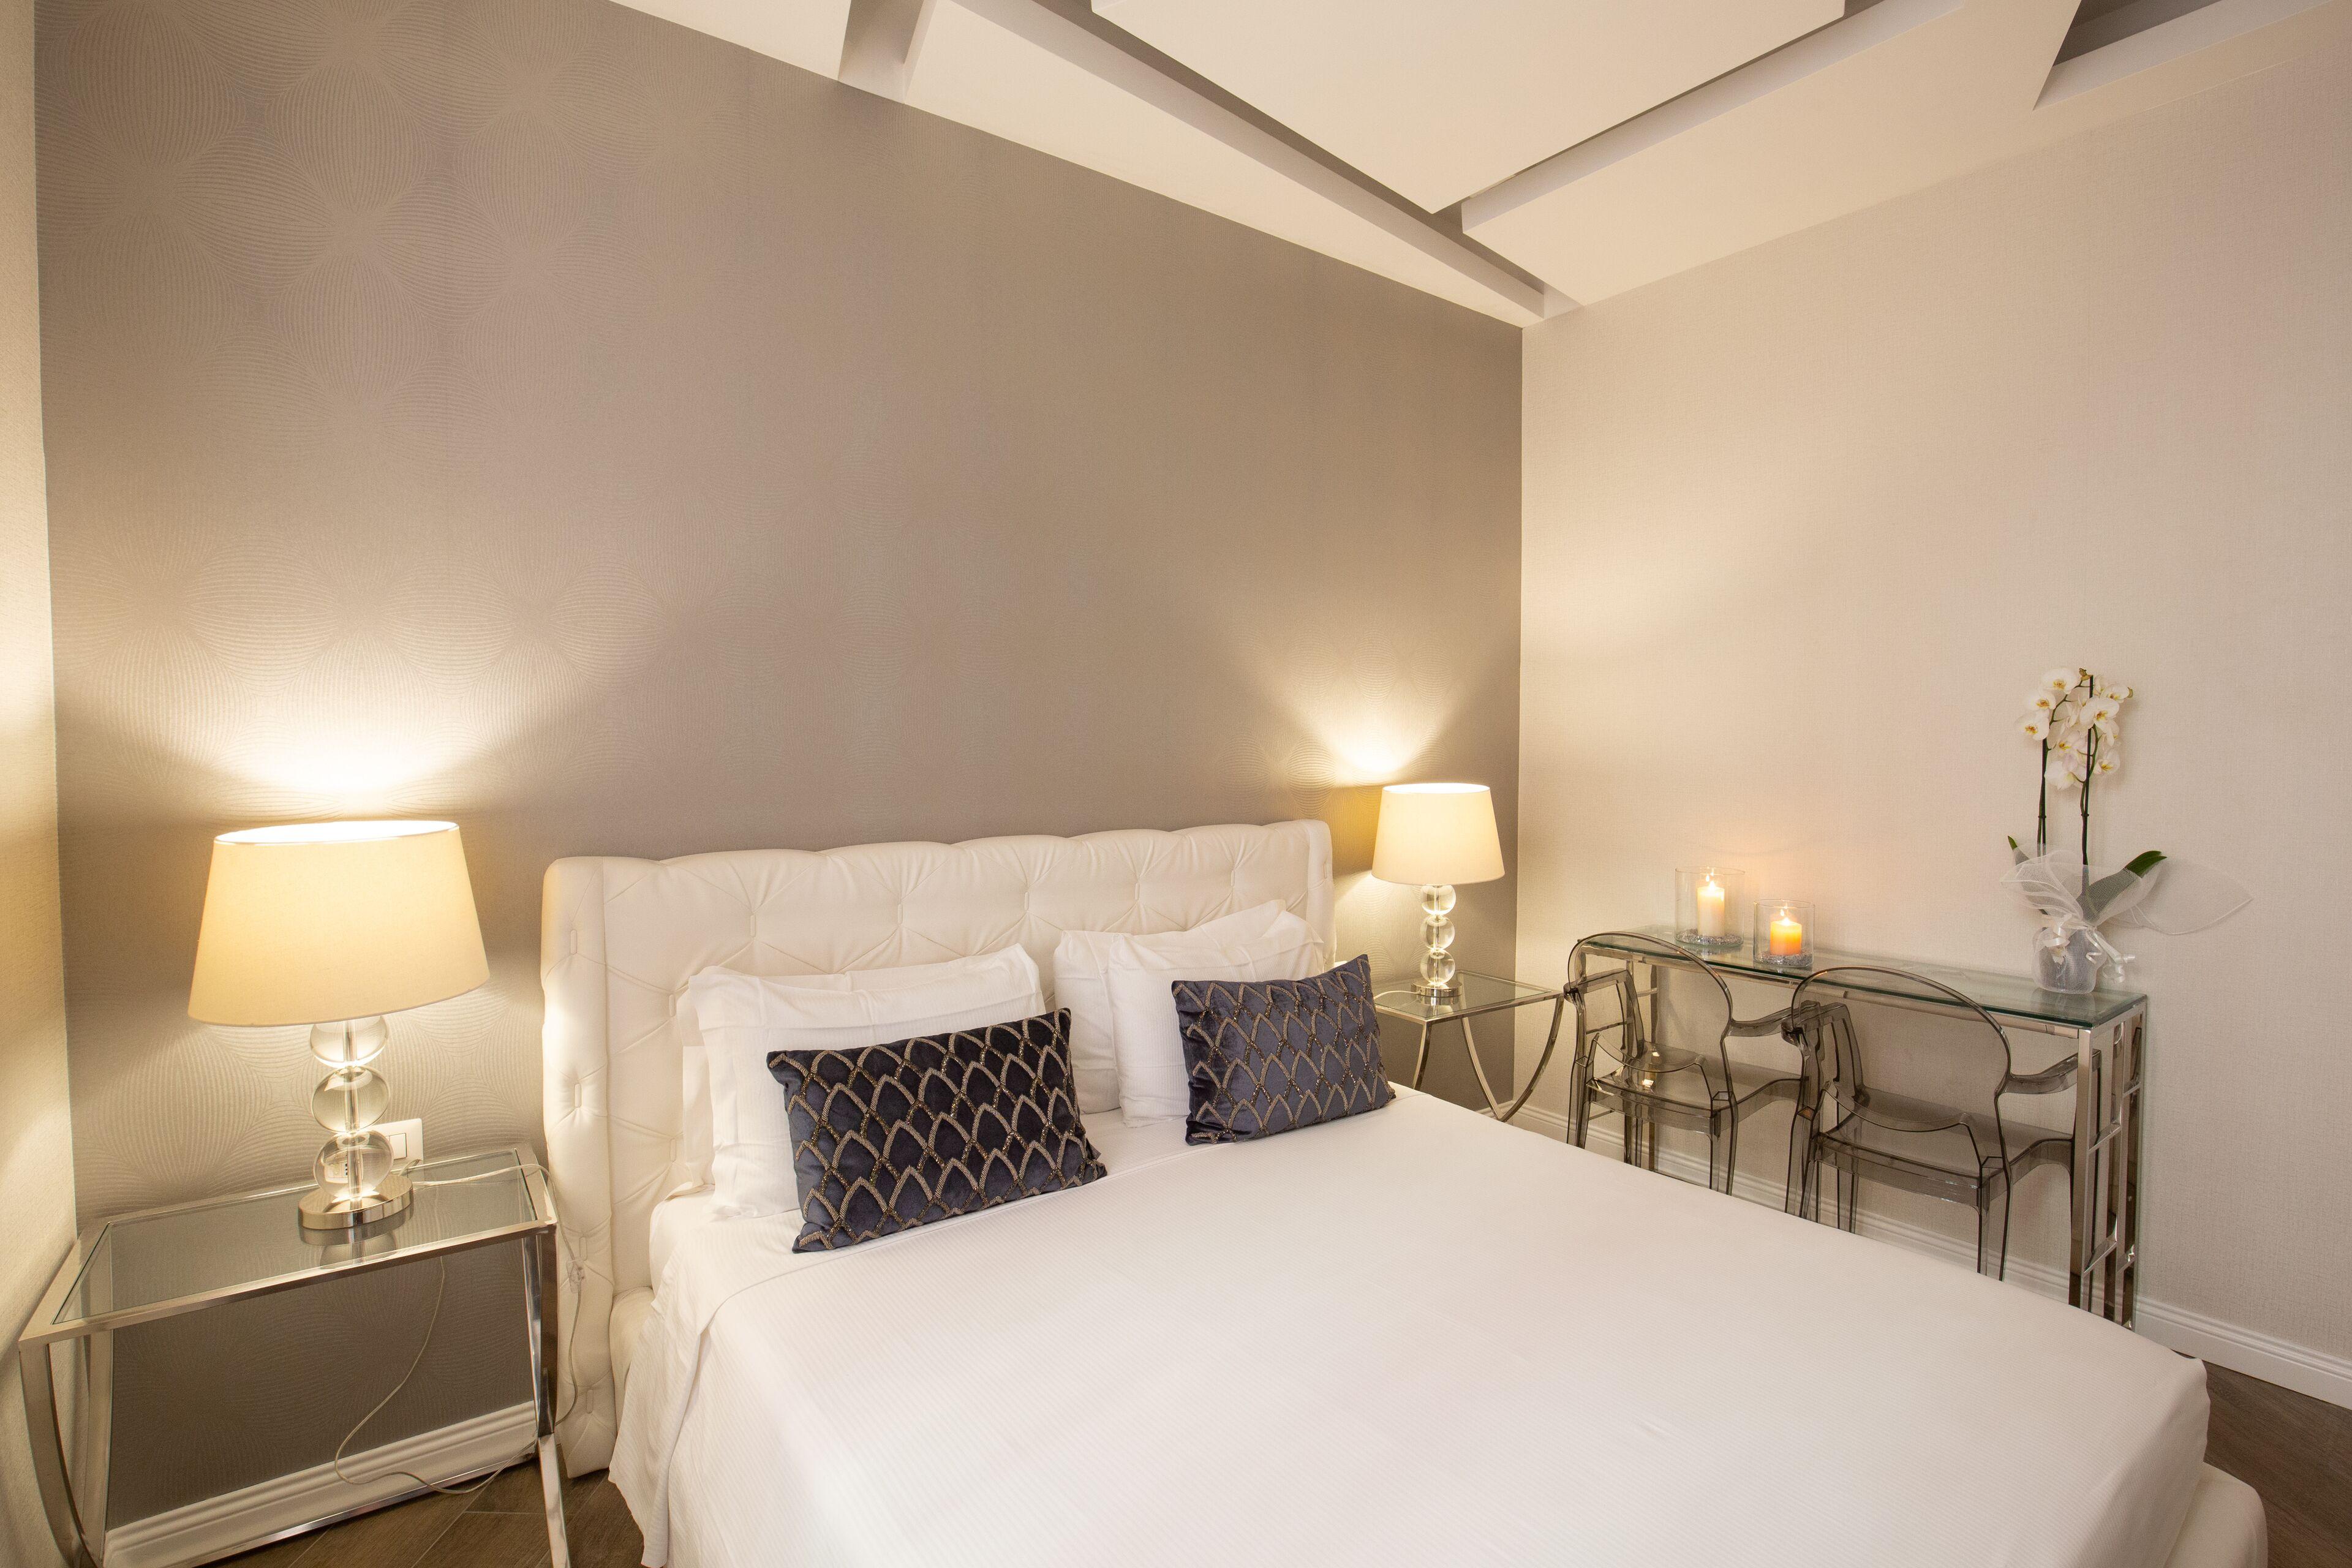 Deco Corso Suite Luxury Rooms